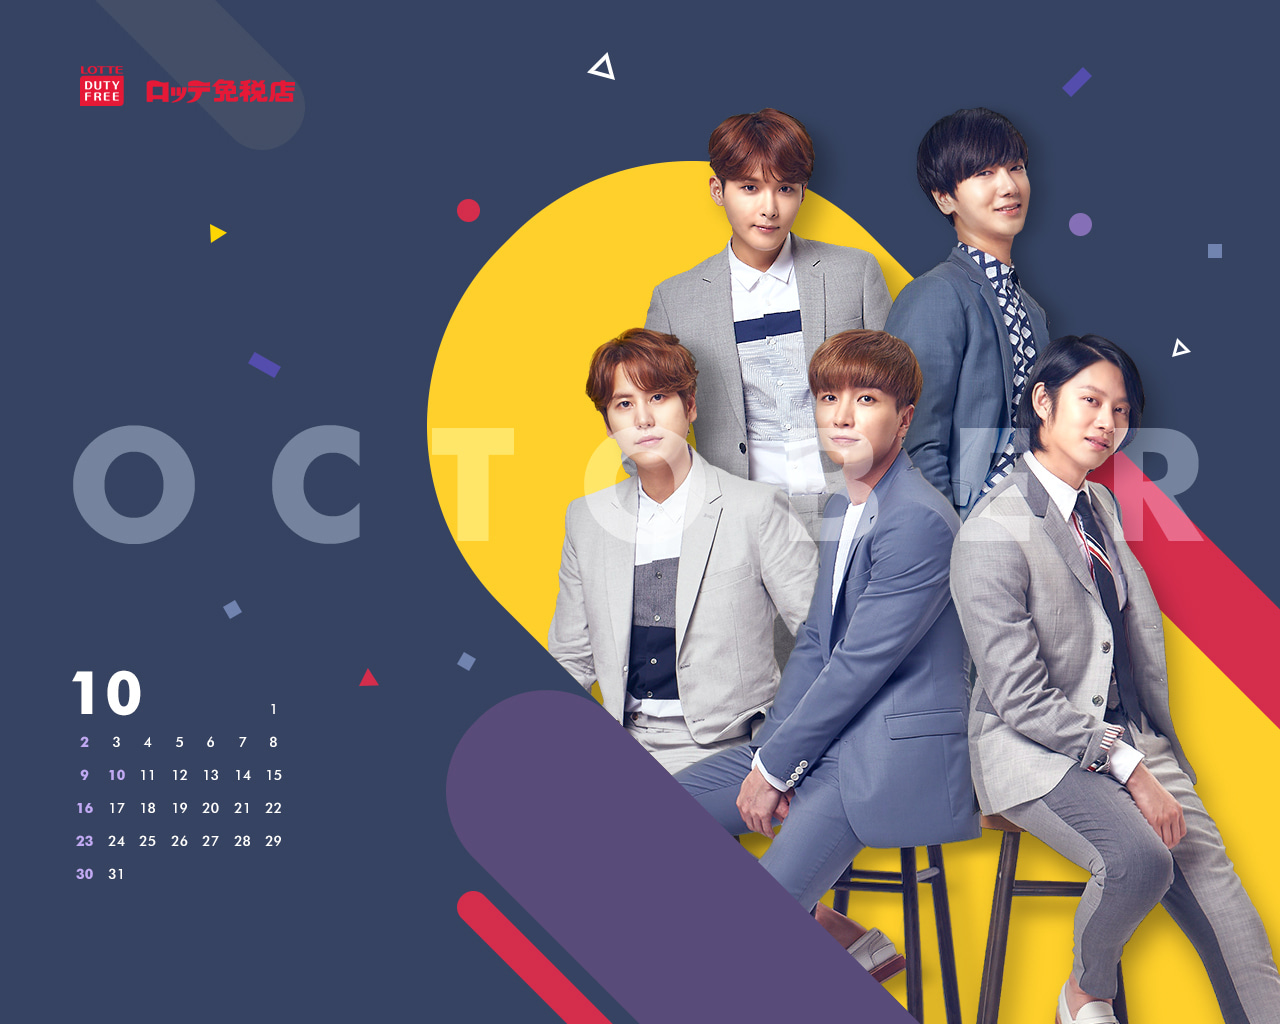 Super Junior ロッテ免税店 16年10月 カレンダー Pc背景壁紙 高画質画像 K Pop Bigbang Twice Exo 防弾少年団 東方神起 Super Junior最新情報